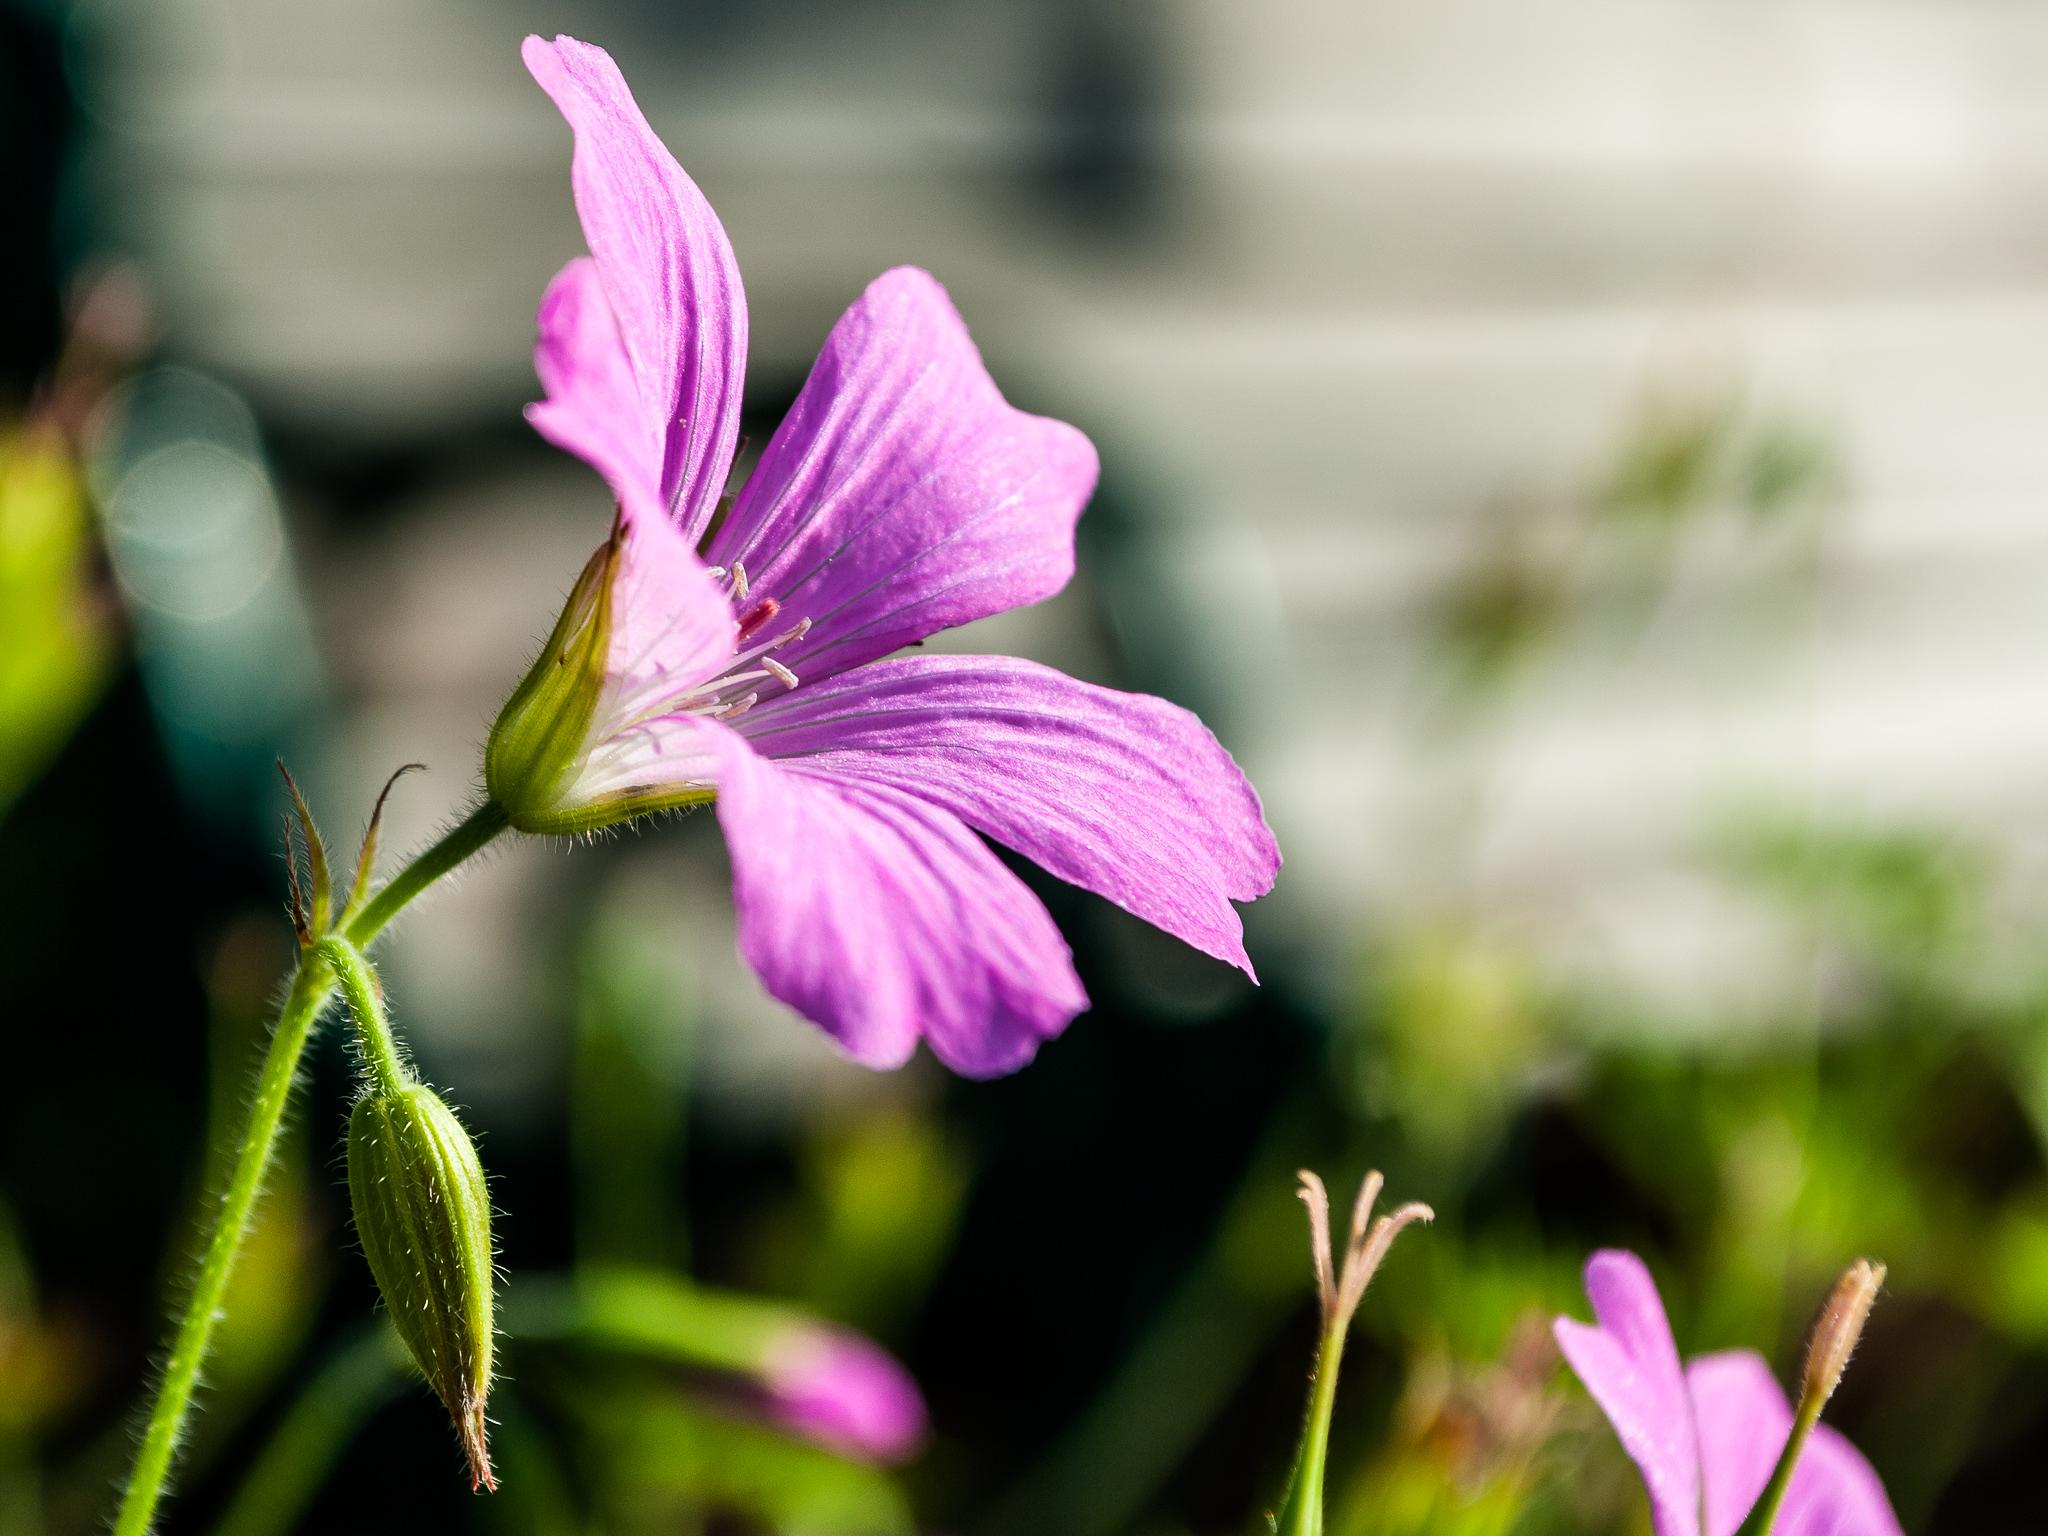 Light purple flower by Micke Seise